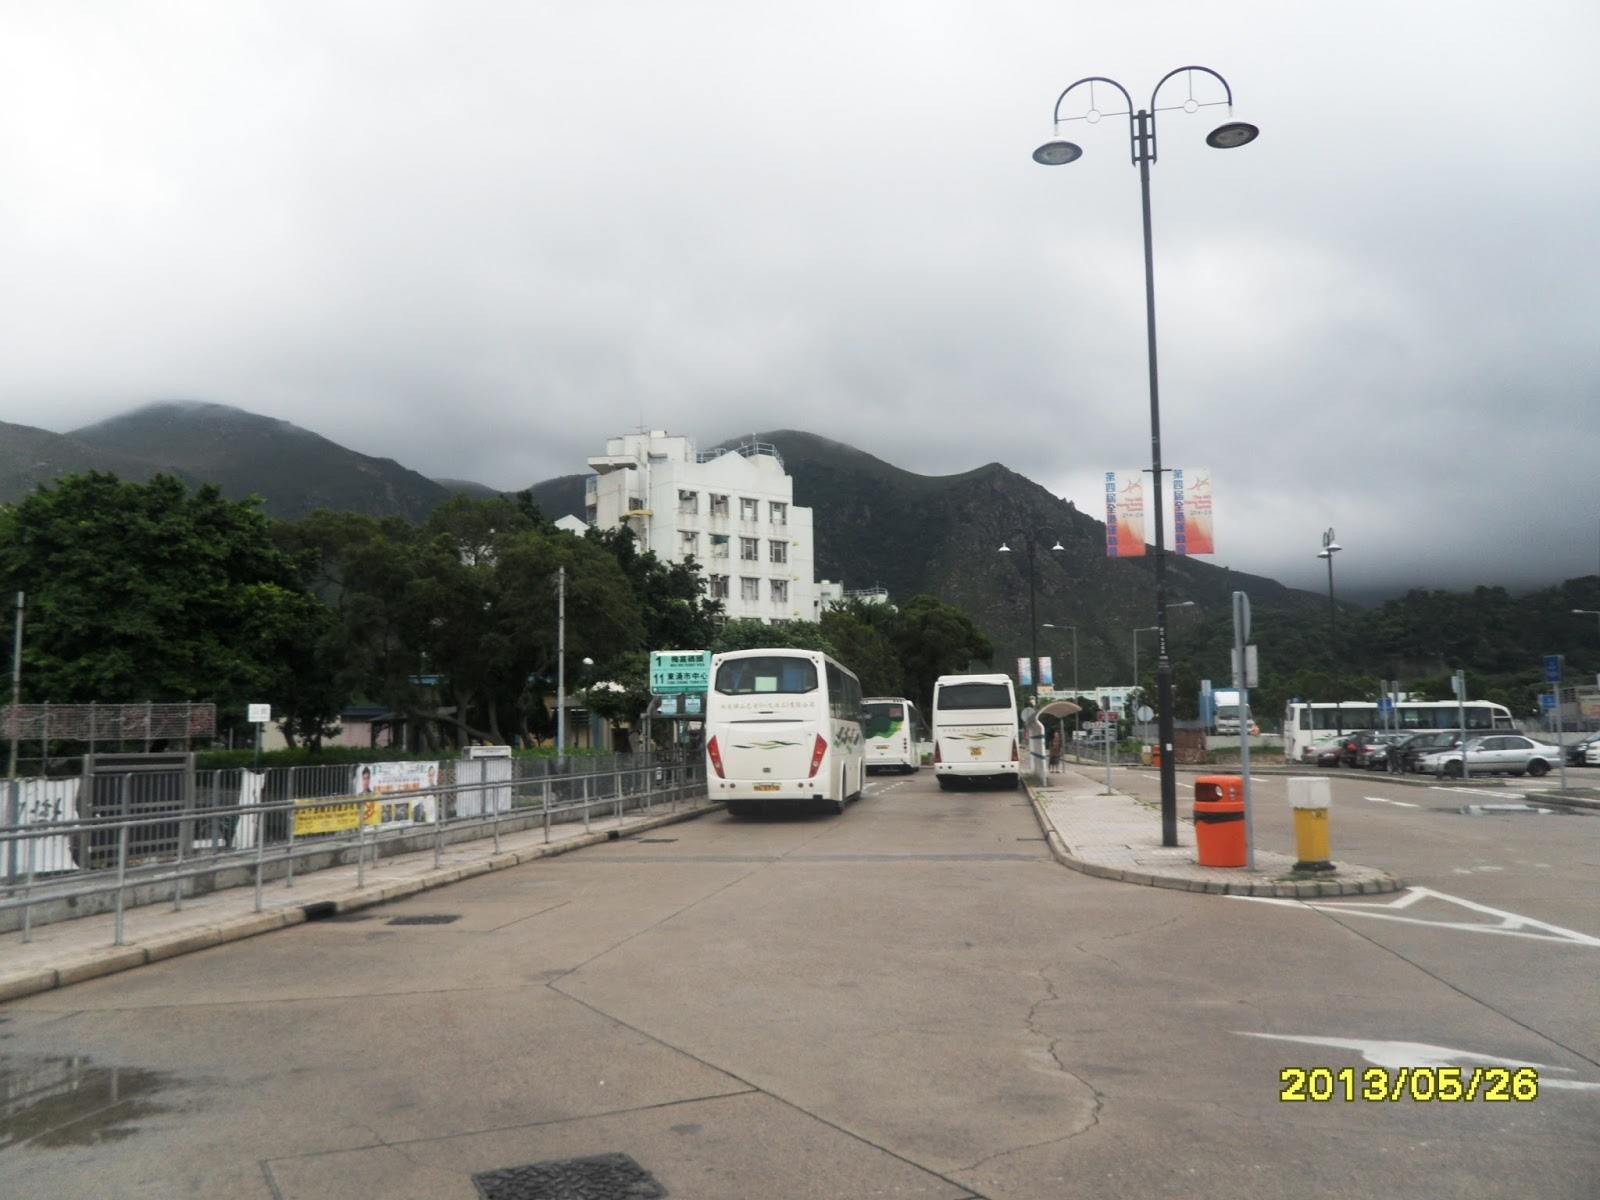 sightseeing13: 東涌-大澳-沙螺灣